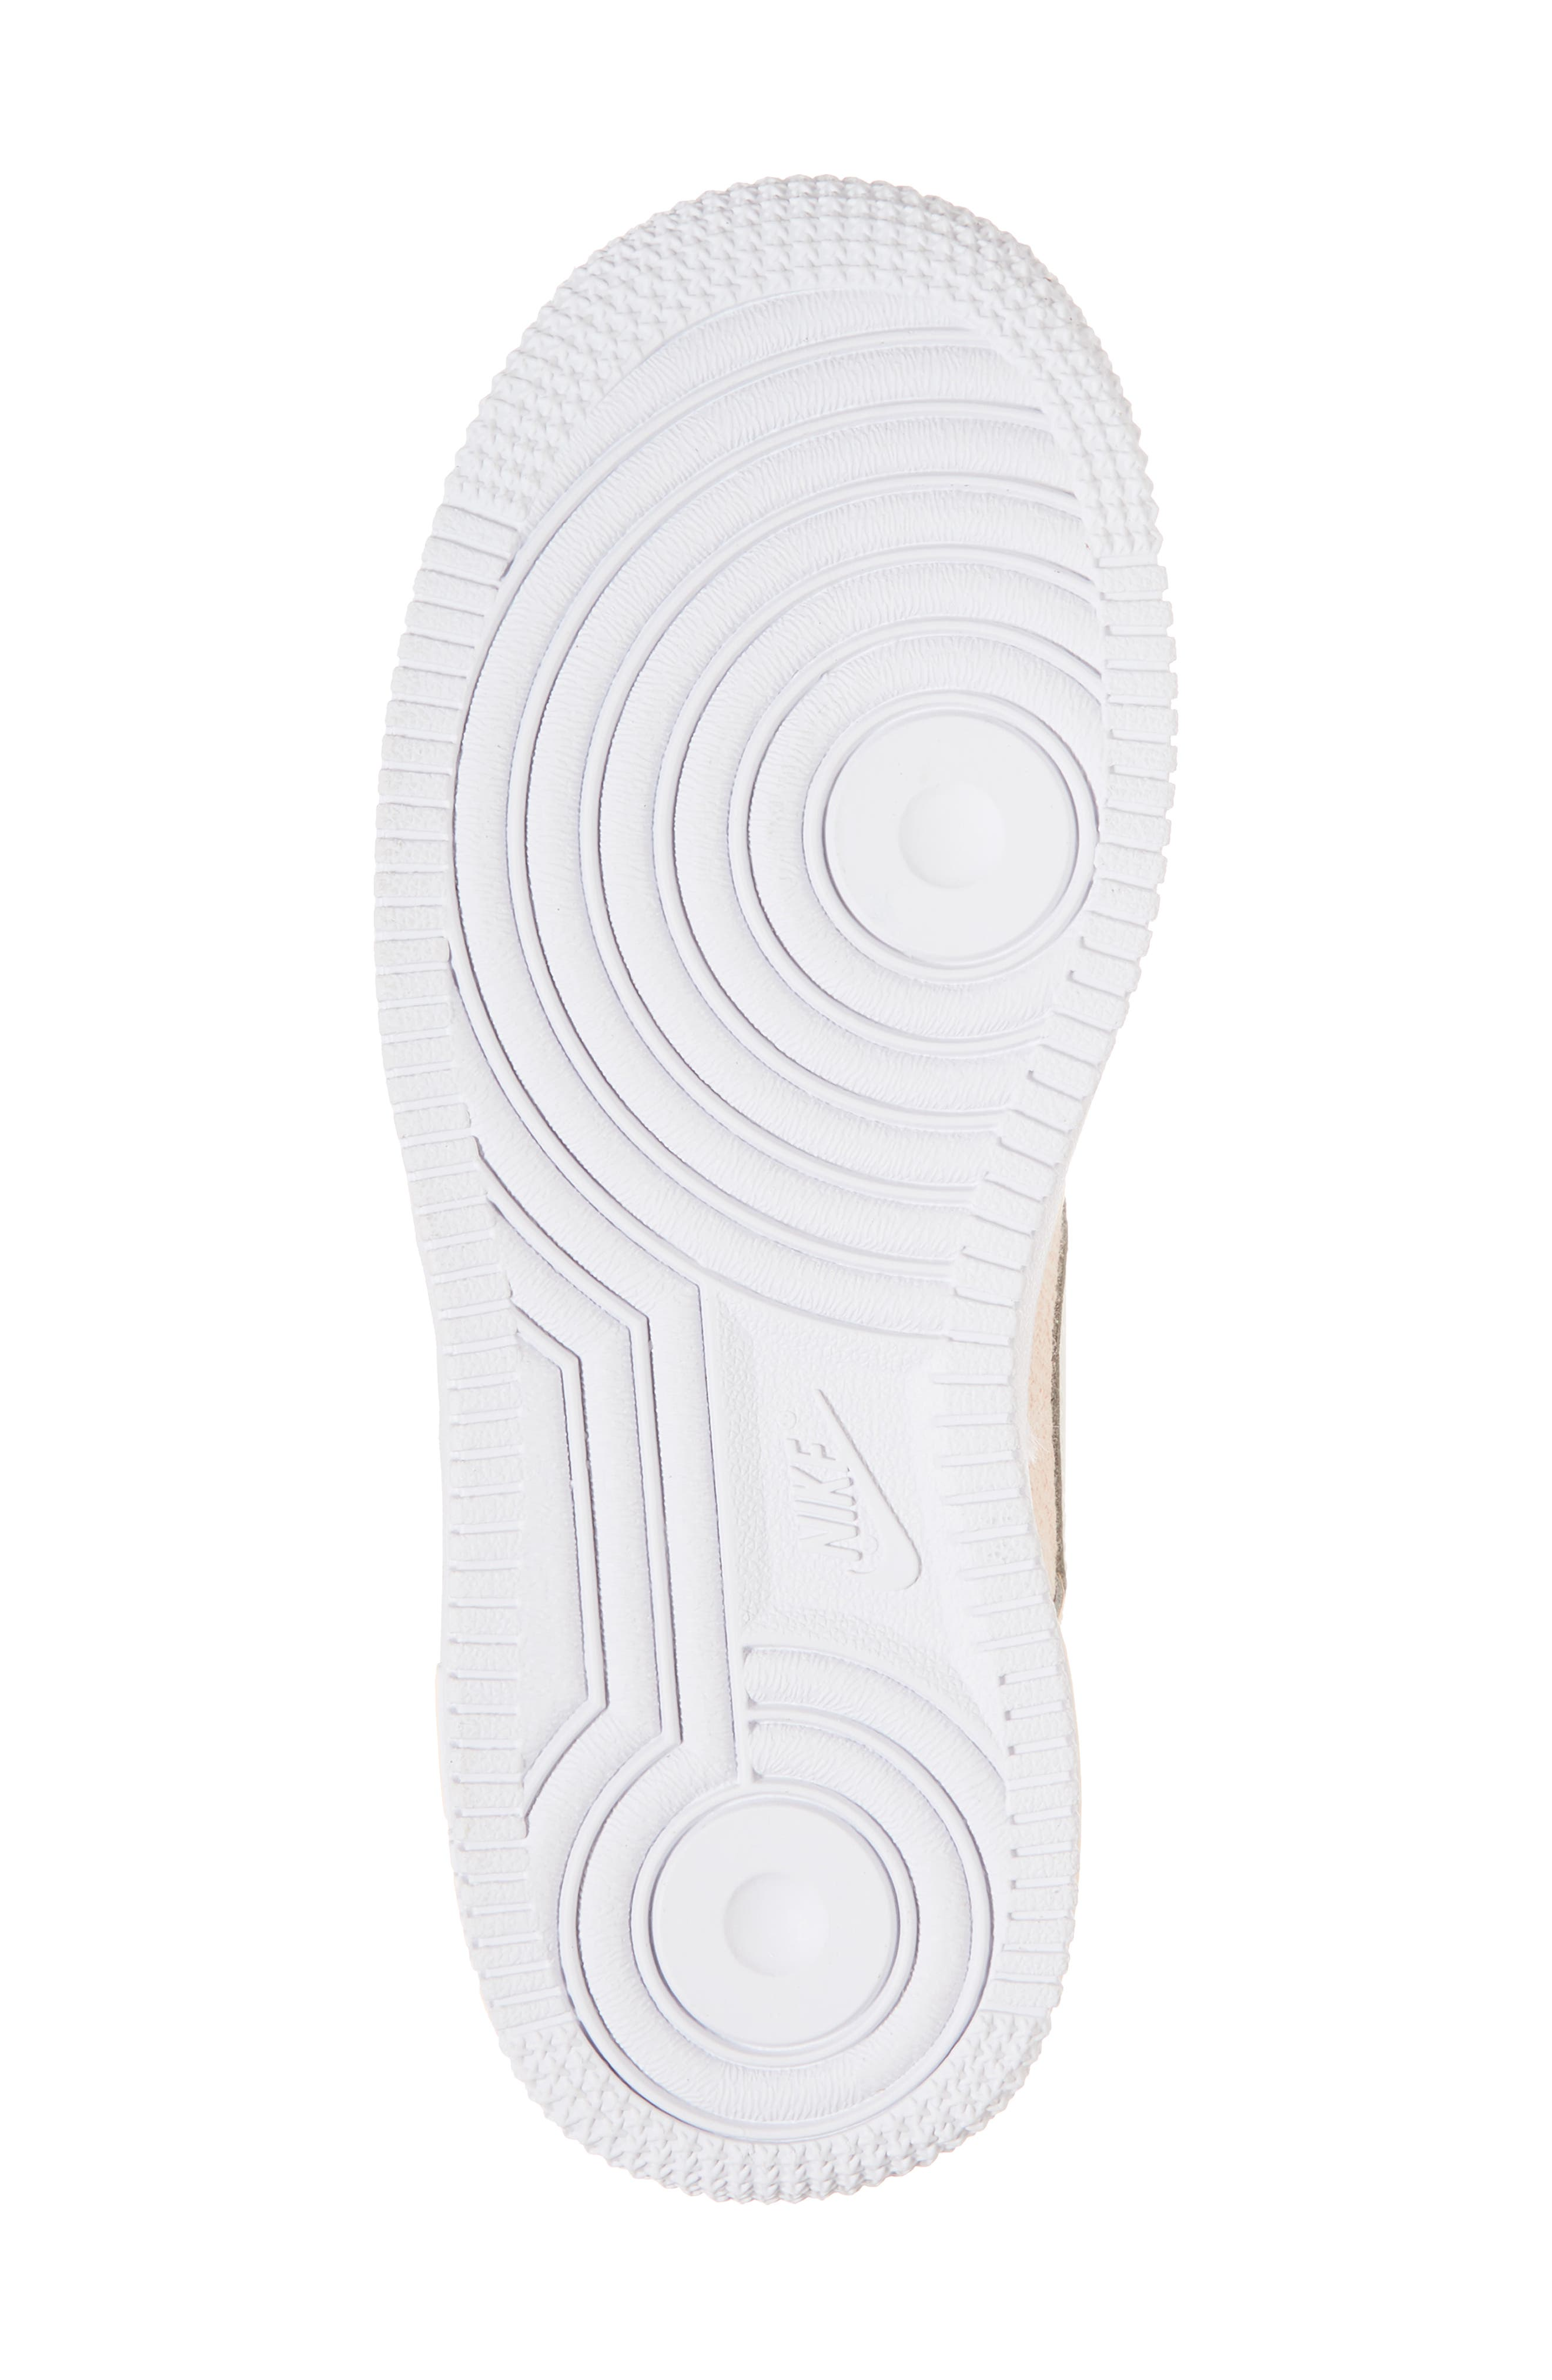 Air Force 1 LV8 Sneaker,                             Alternate thumbnail 6, color,                             Crimson Tint/ Sail/ White